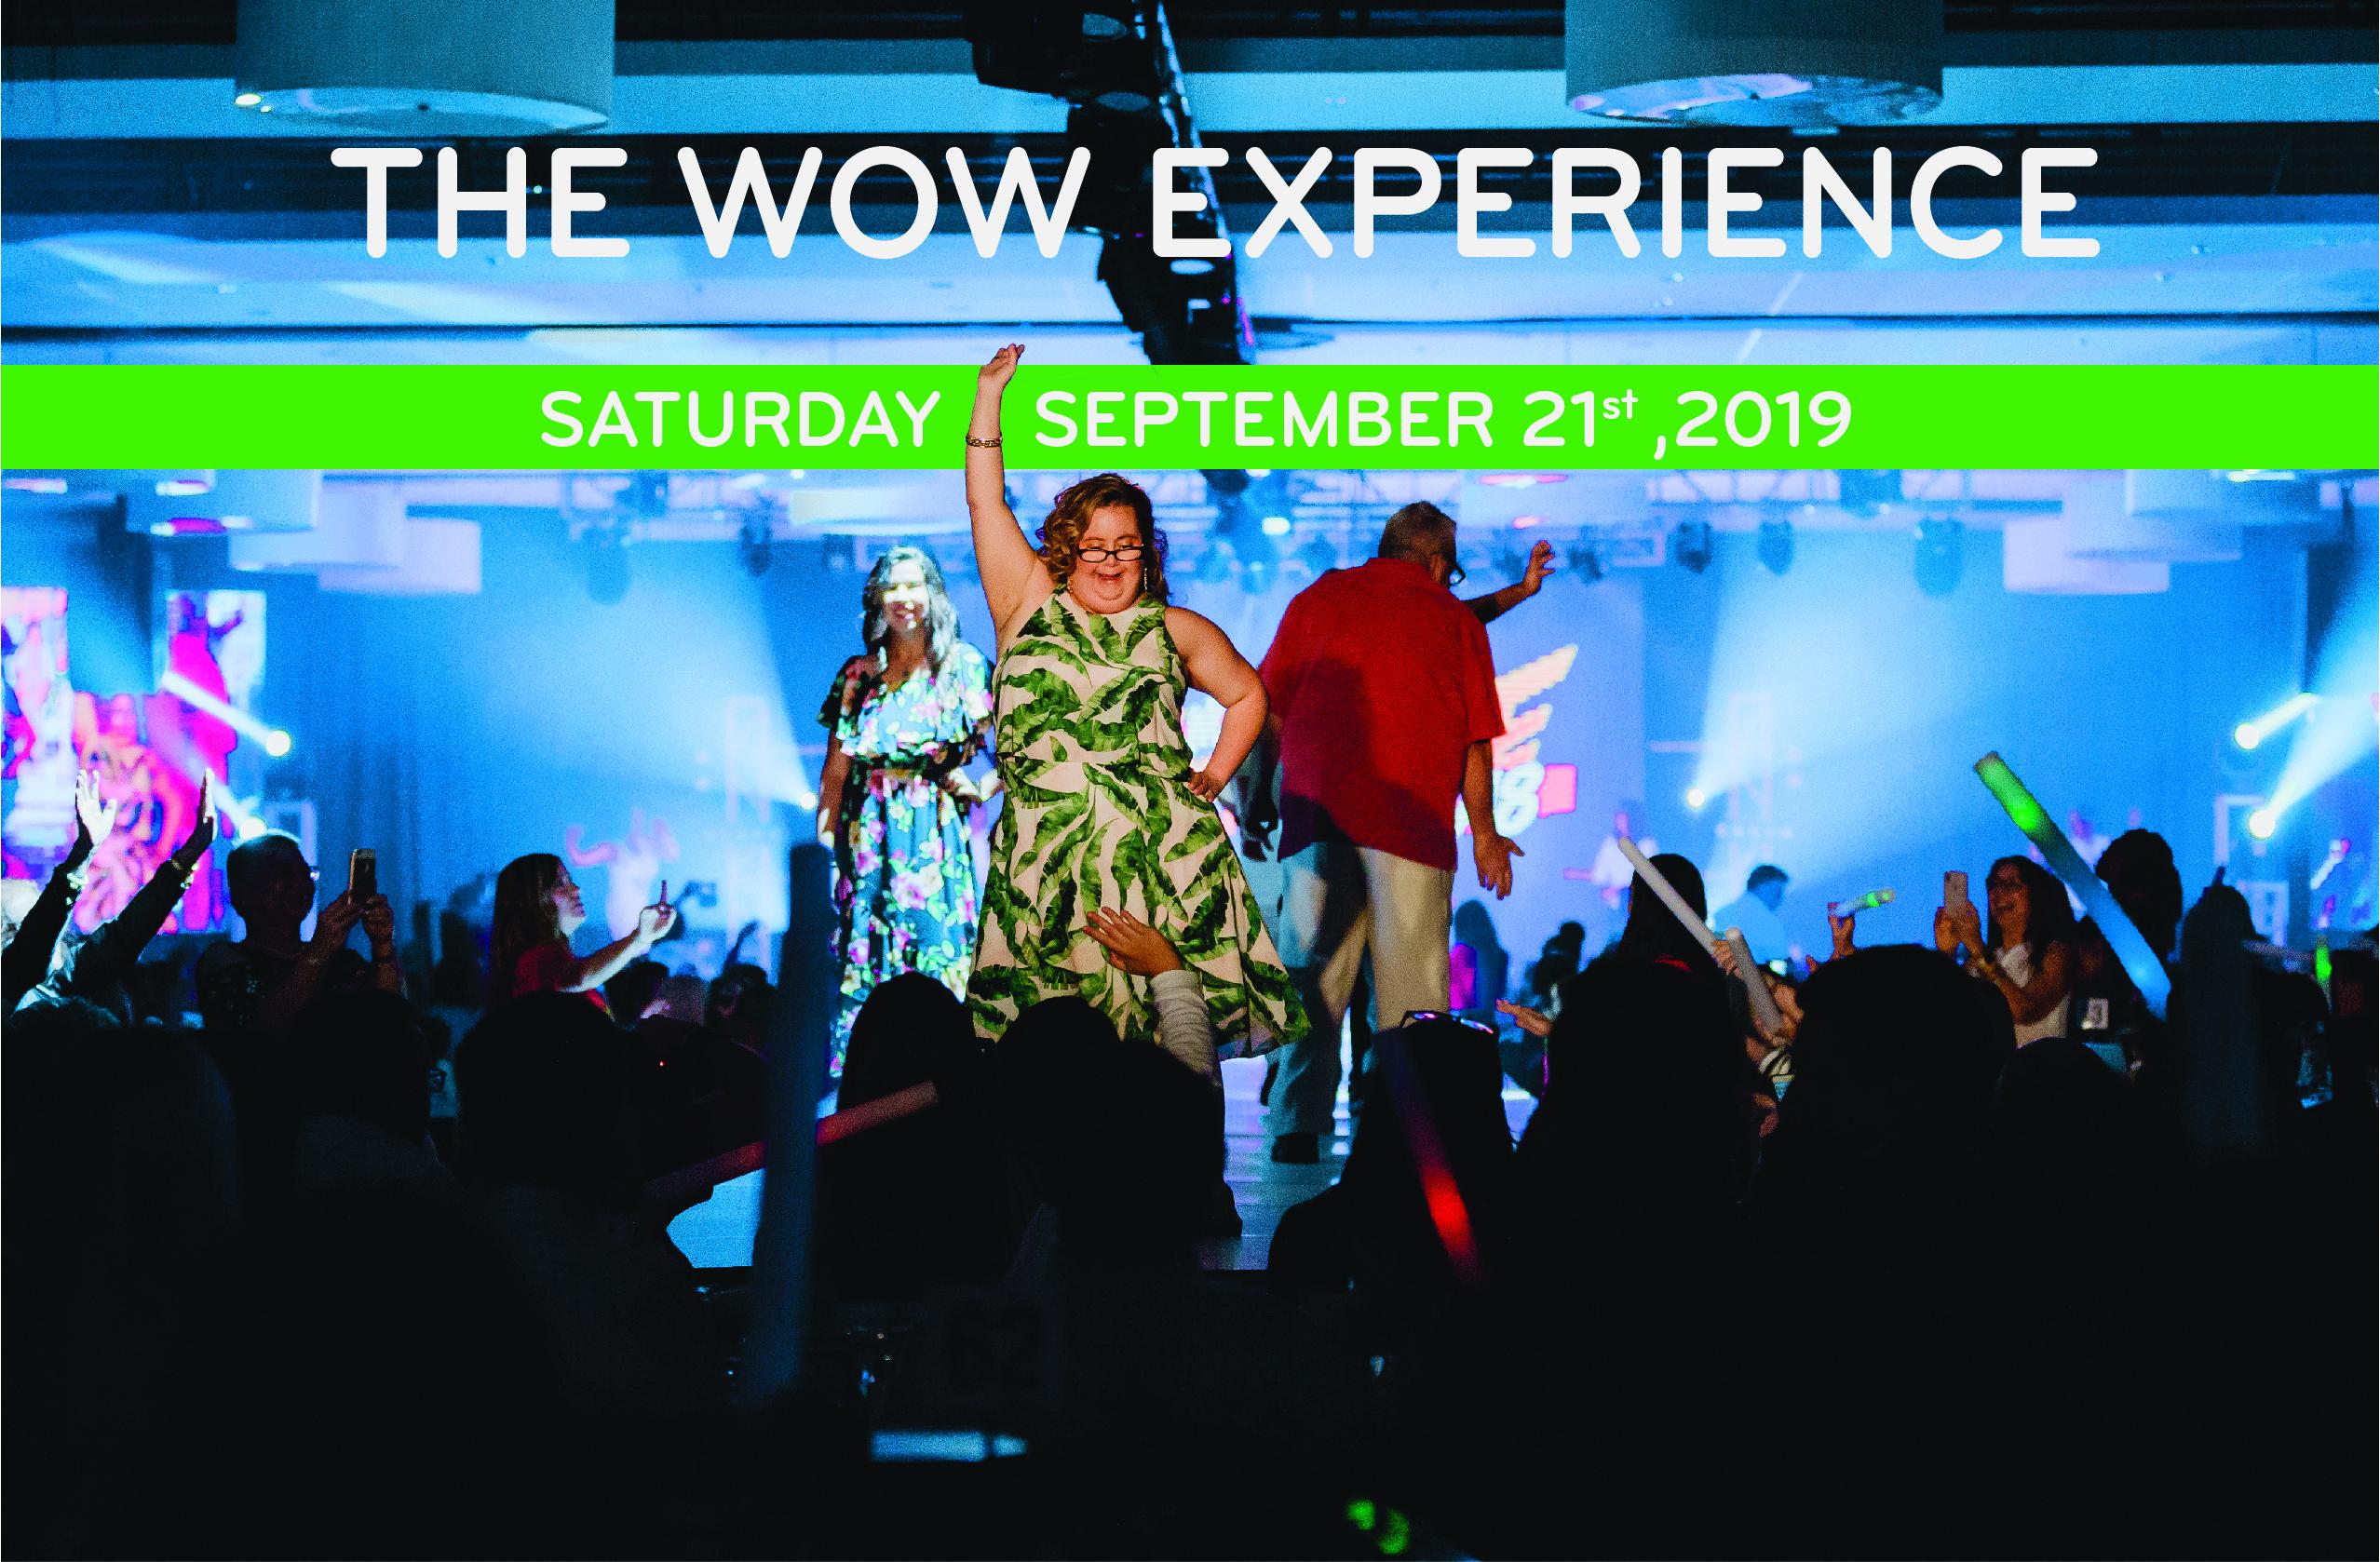 THE WOW EXPERIENCE - The Wow Center Miami The Wow Center Miami